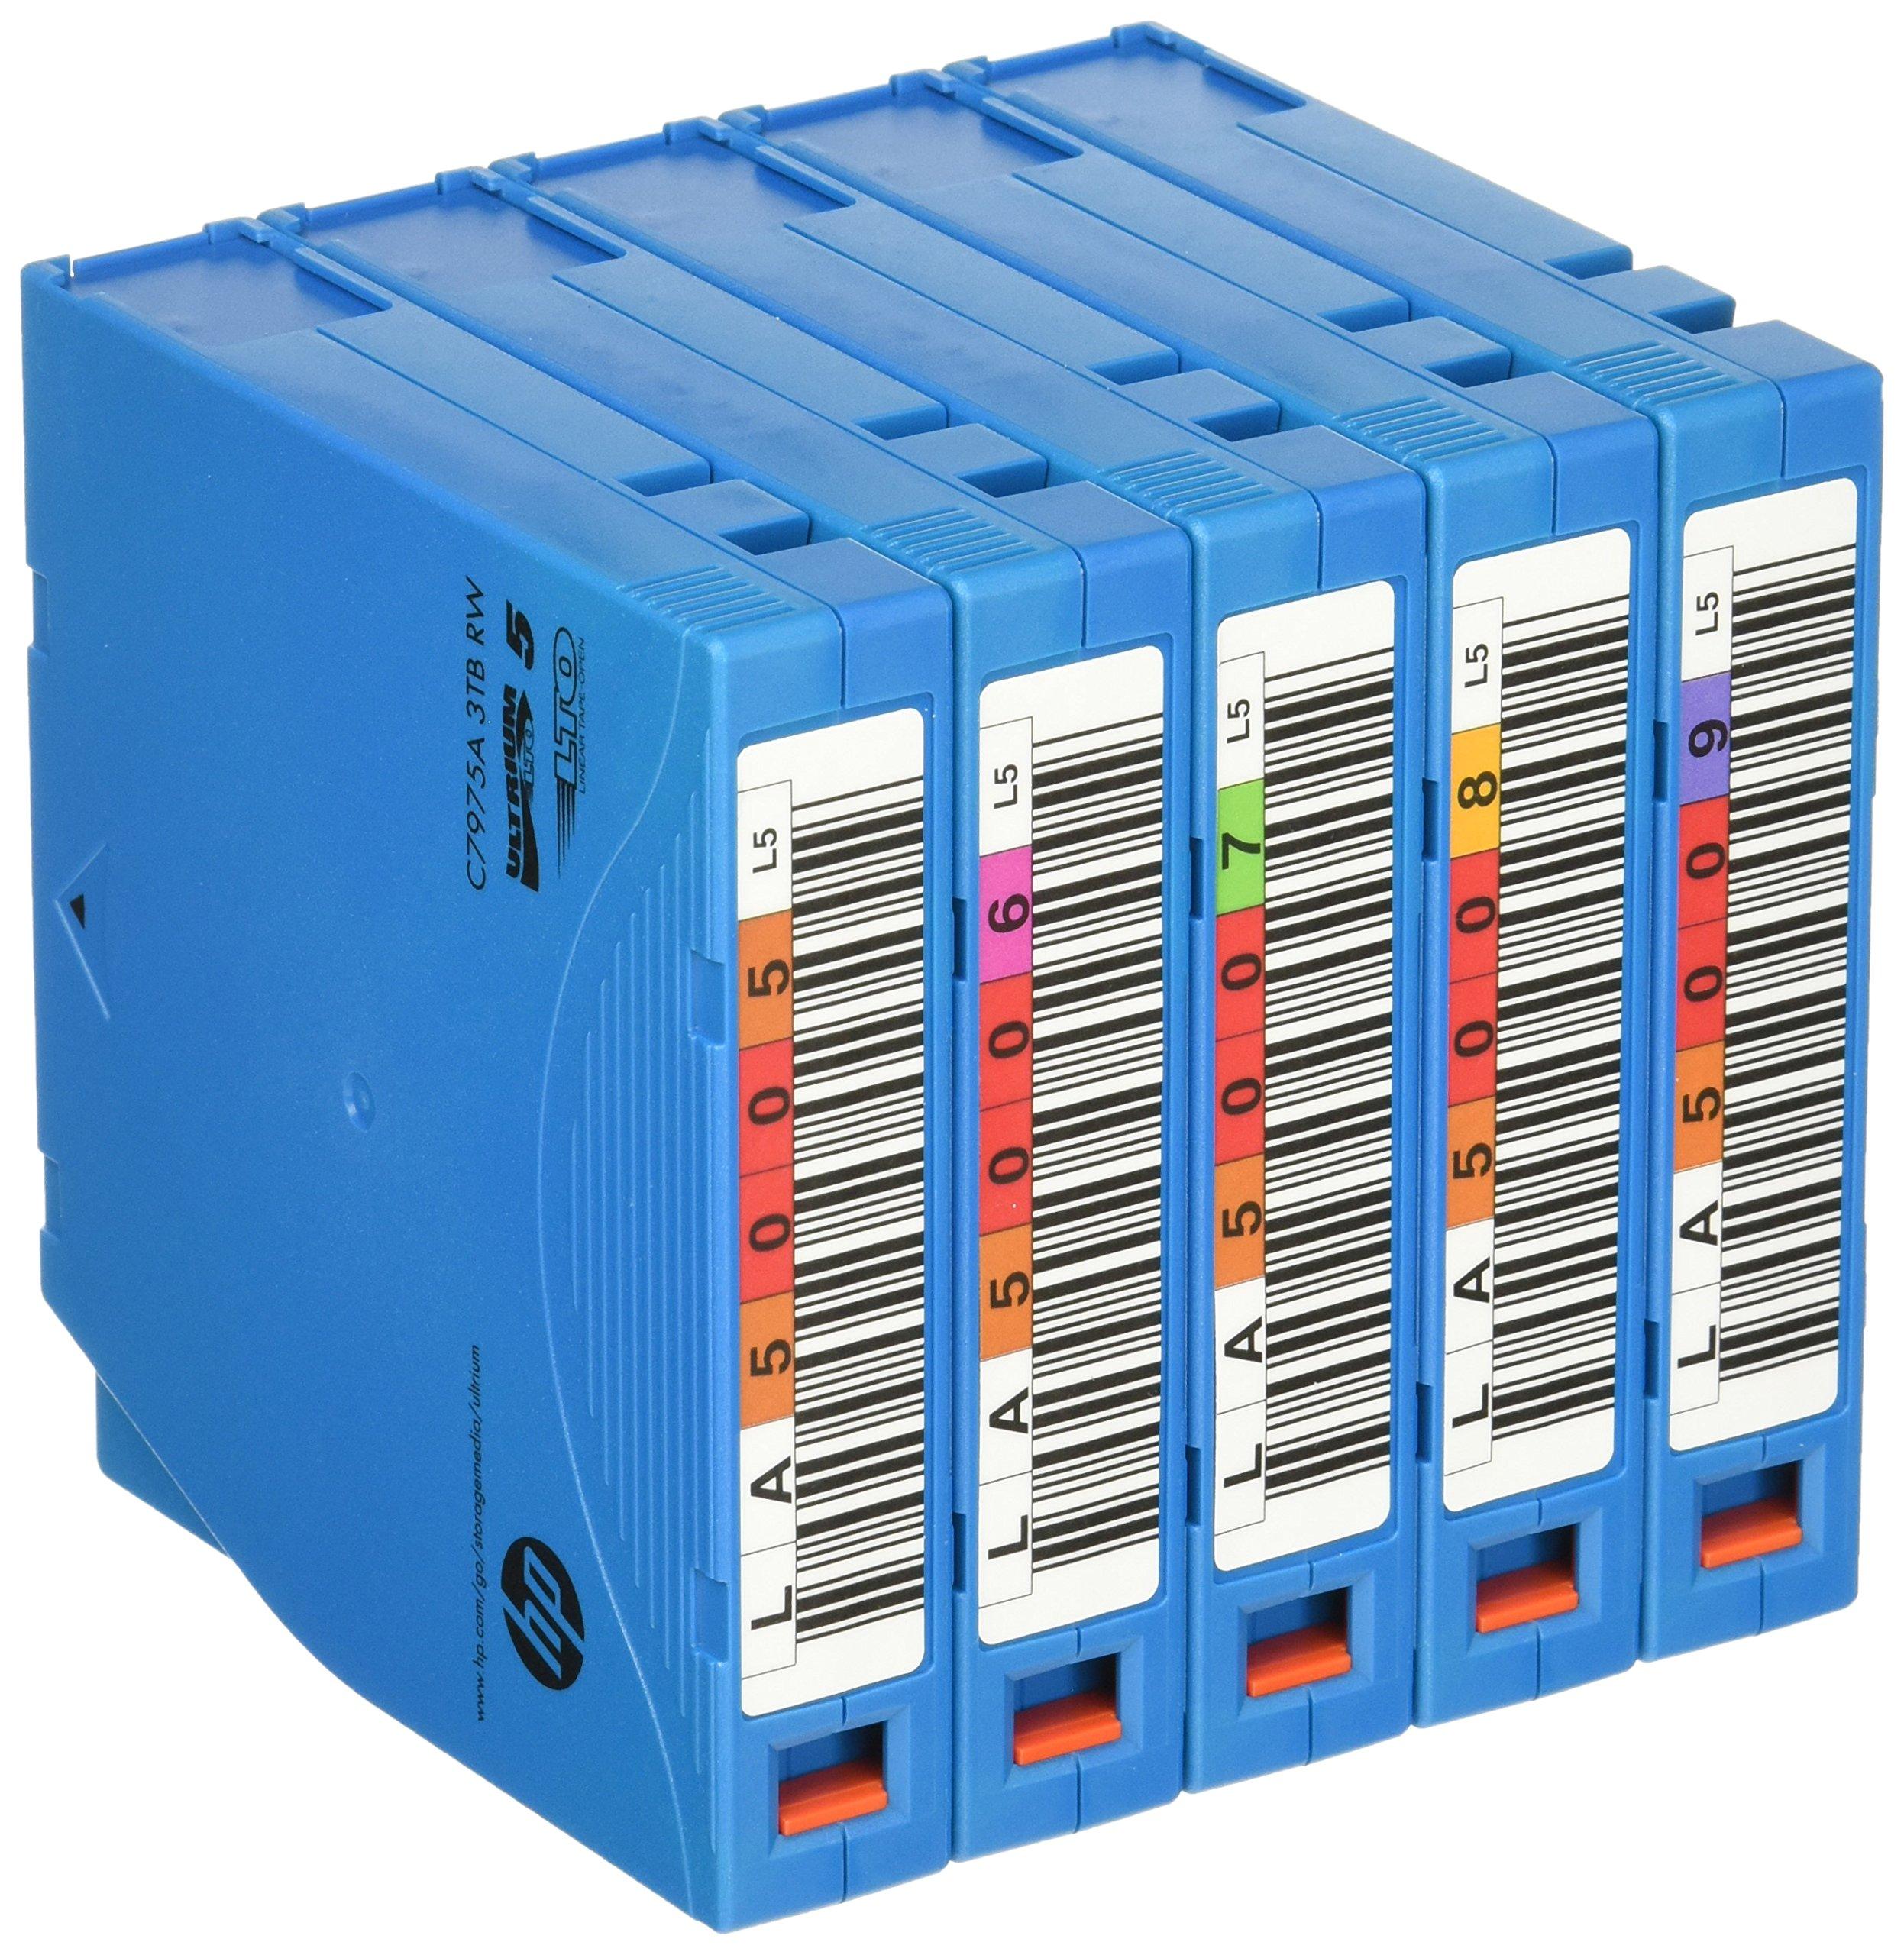 Hewlett Packard Hp Lto-5 Ultrium Eco Case 3 Tb Tape (Pack Of 5)